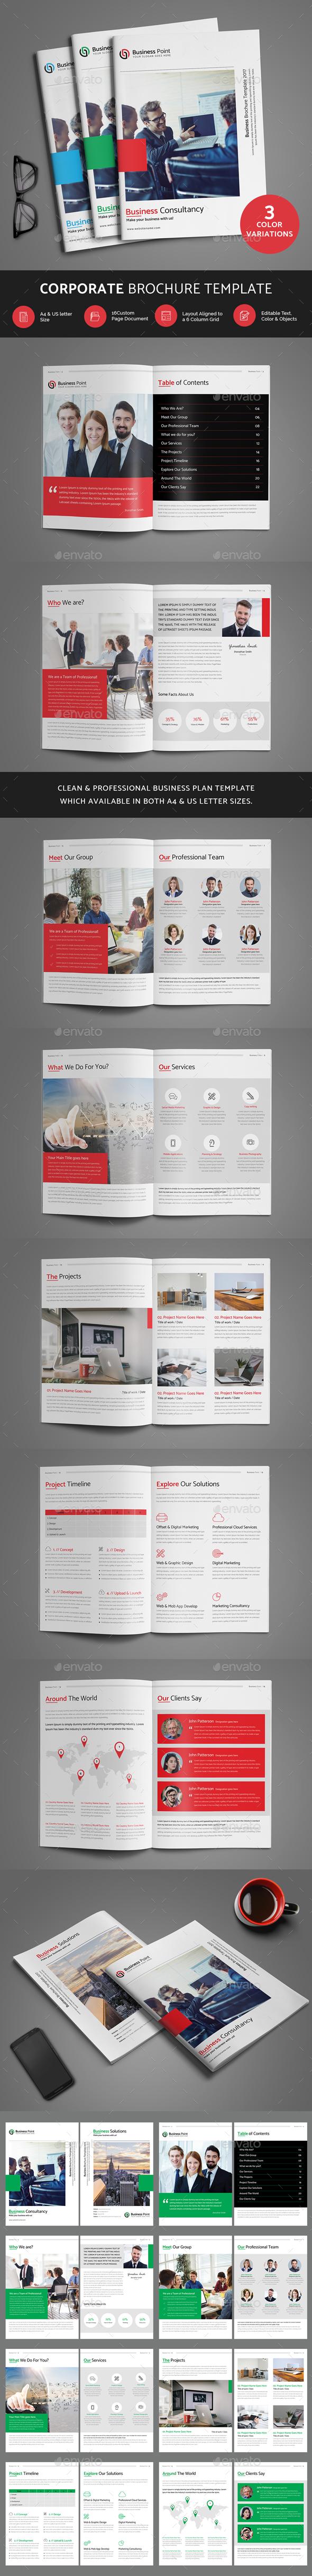 Corporate Brochure - Print Templates